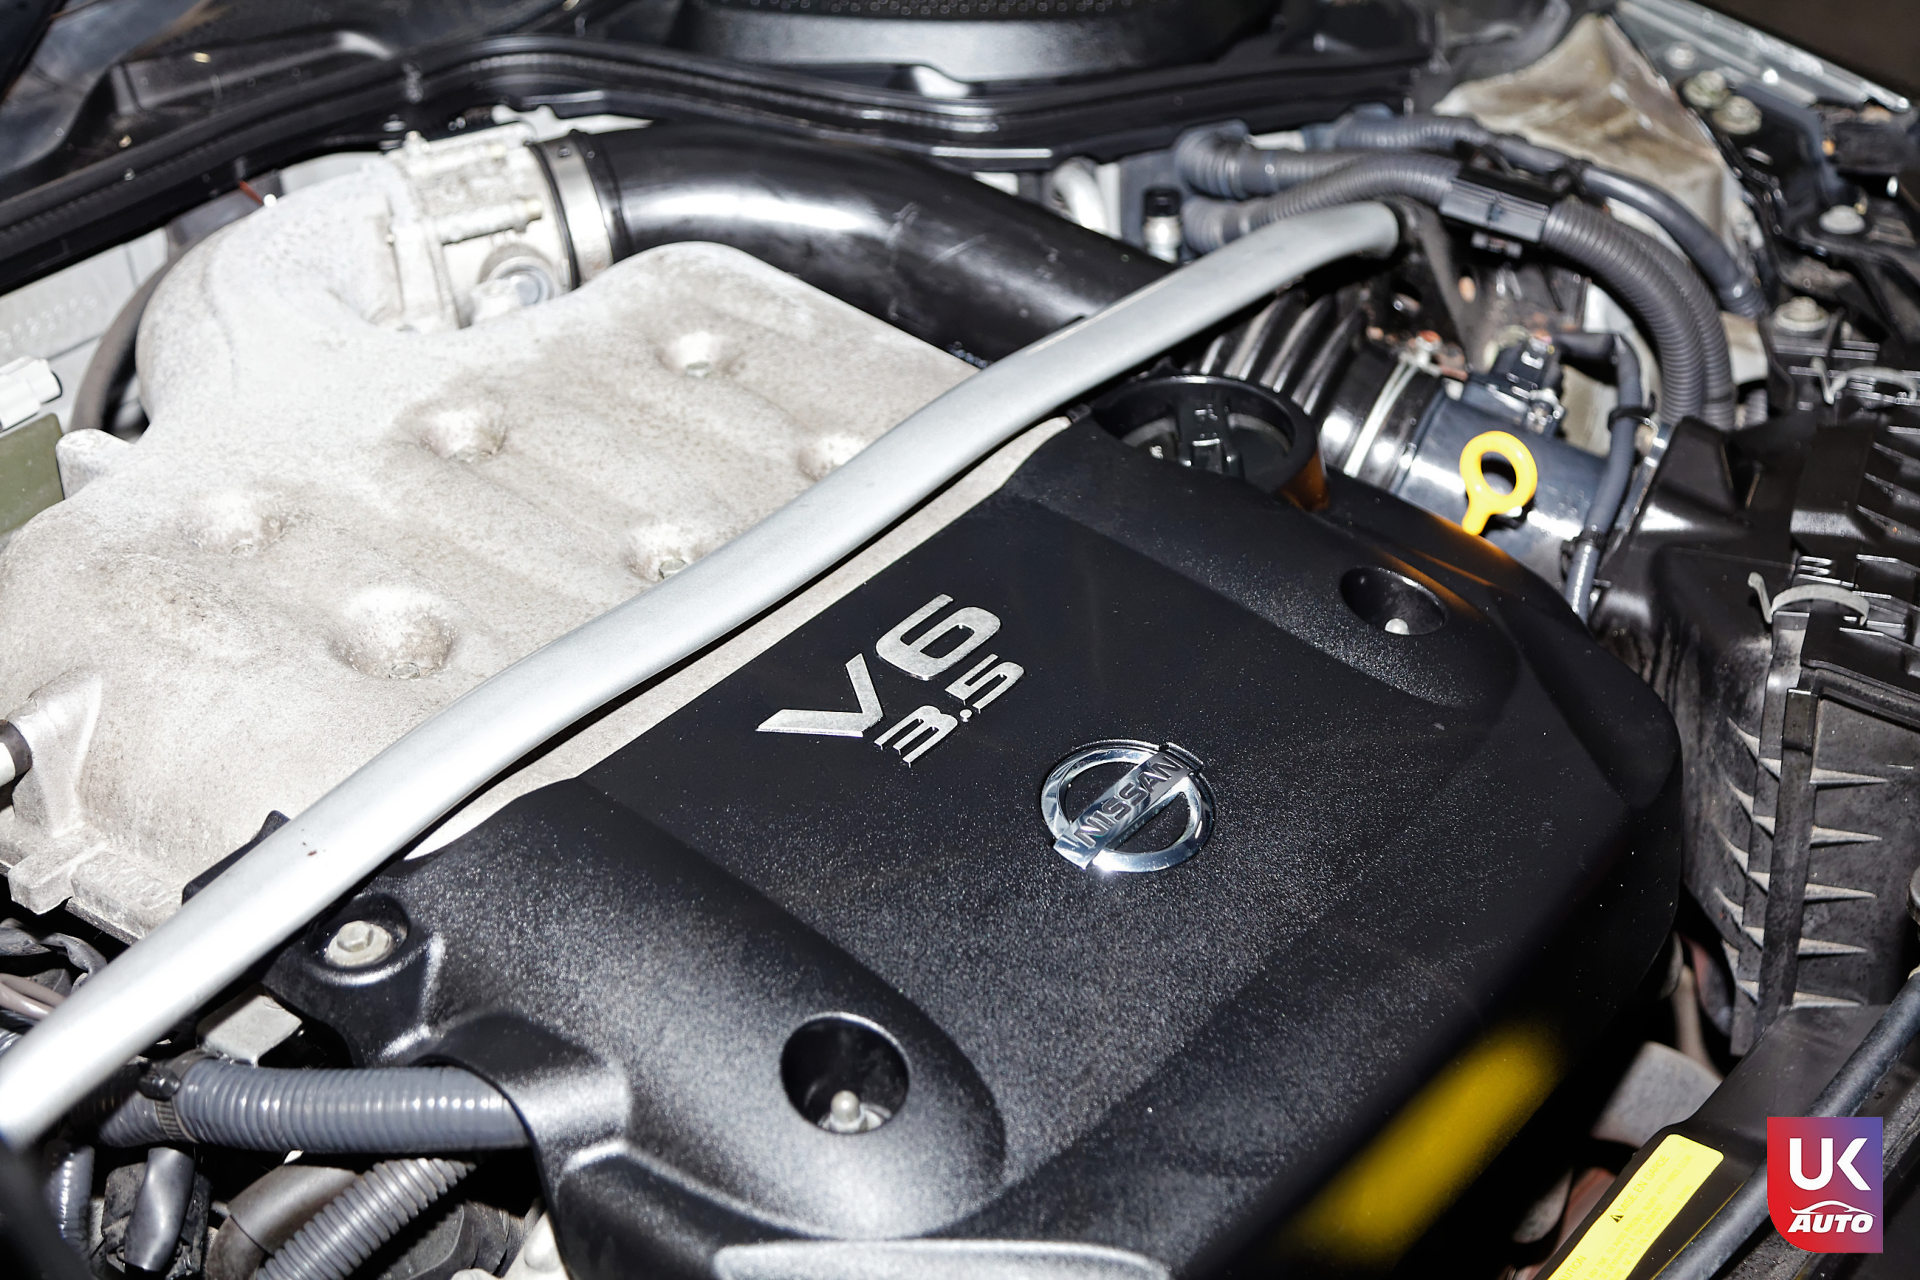 Nissan 350z rhd v6 nissan angleterre nissan uk nissan import rhd voiture occasion mandataire nissan 10 DxO - NISSAN ANGLETERRE IMPORT NISSAN 350Z V6 RHD 3.5 MANDATAIRE NISSAN AUTO AVANT LE BREXIT FELICITATION A XABI